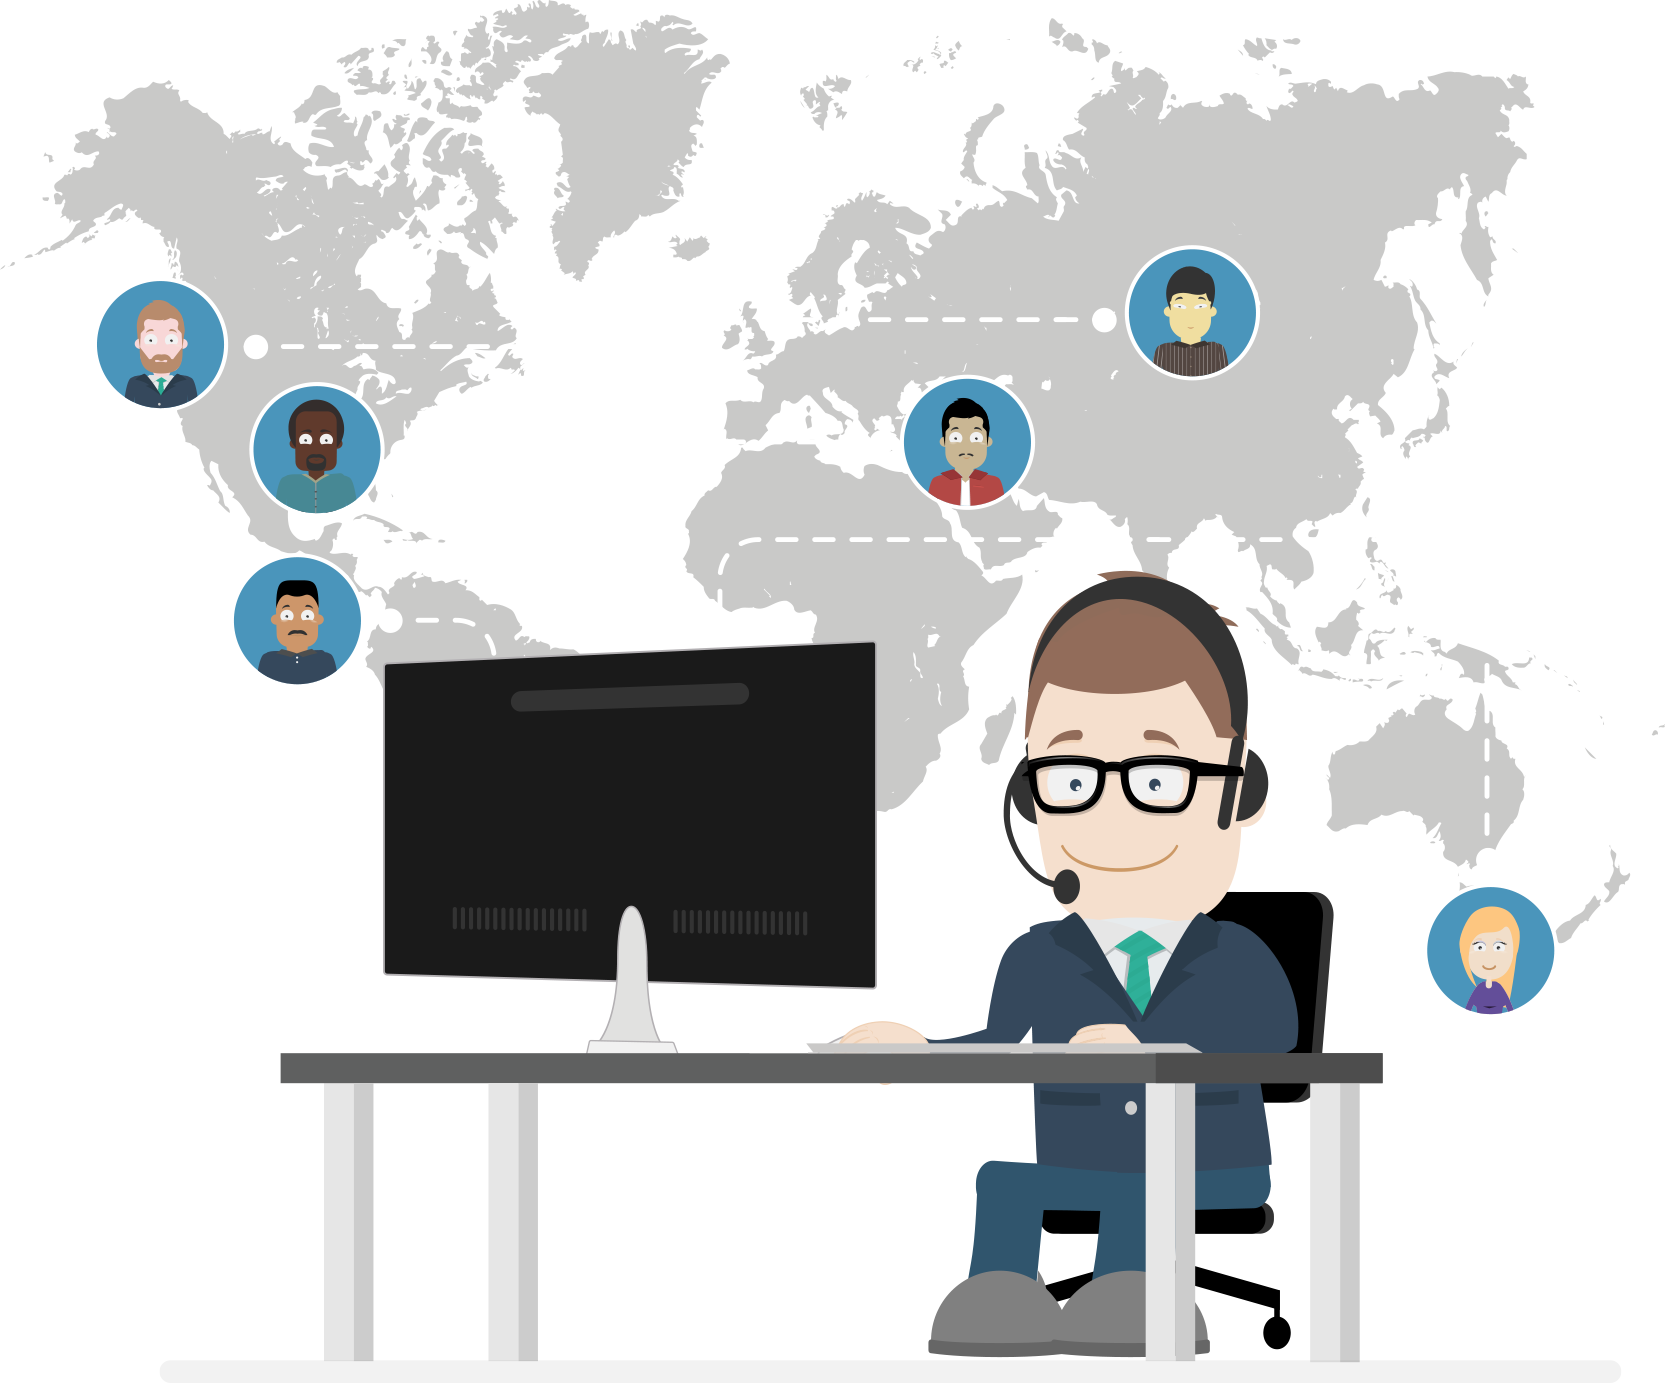 isl-online-remote access